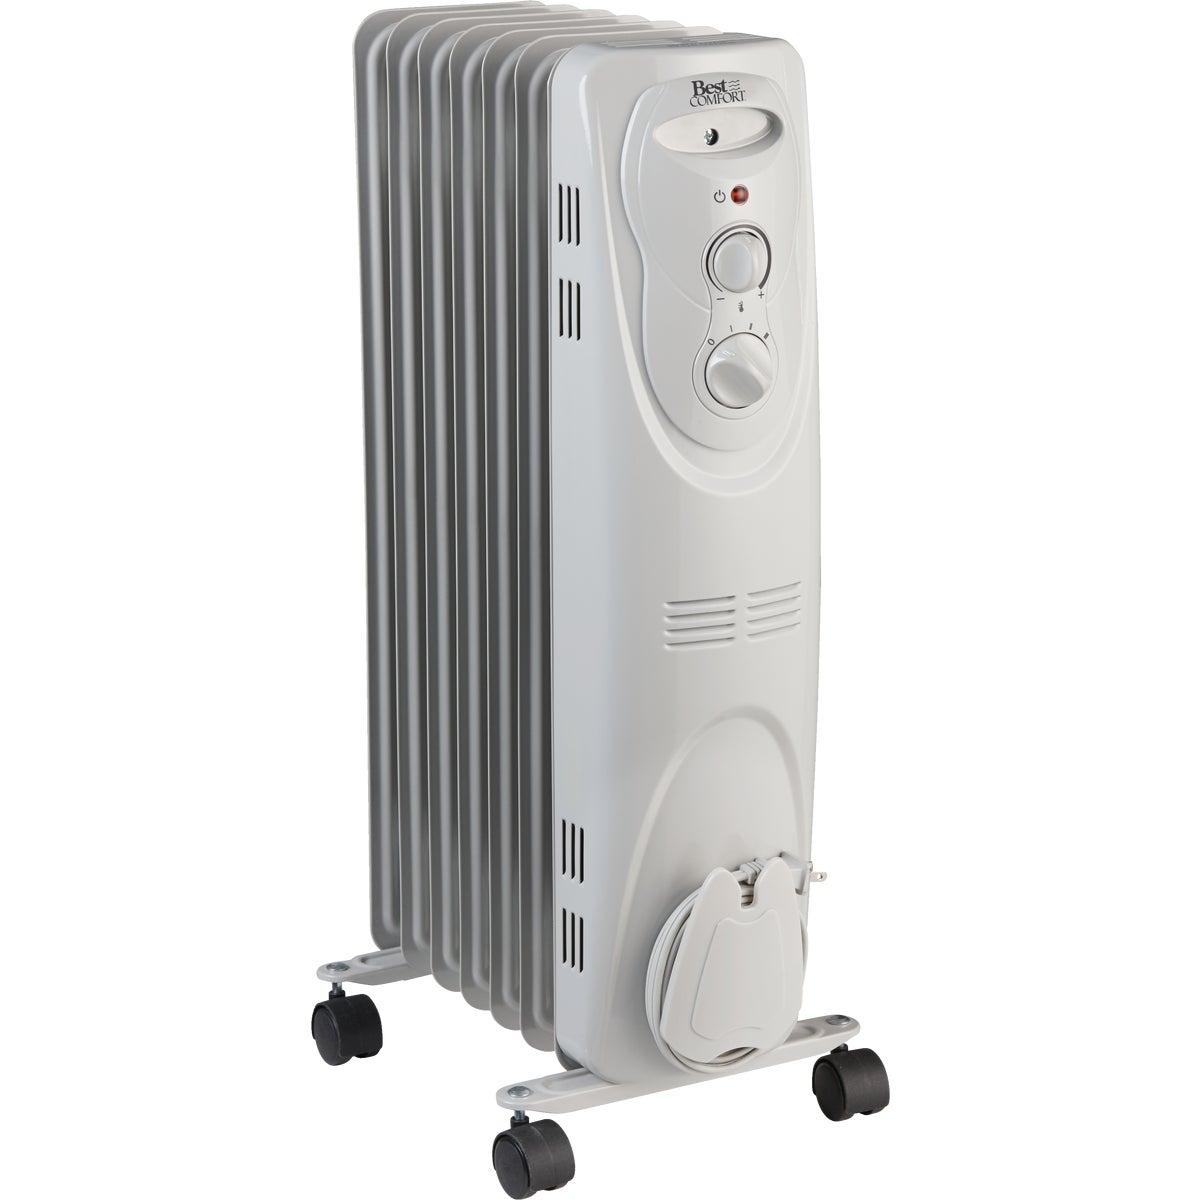 Best Comfort 1500-Watt 120-Volt Oil Filled Radiator Heater